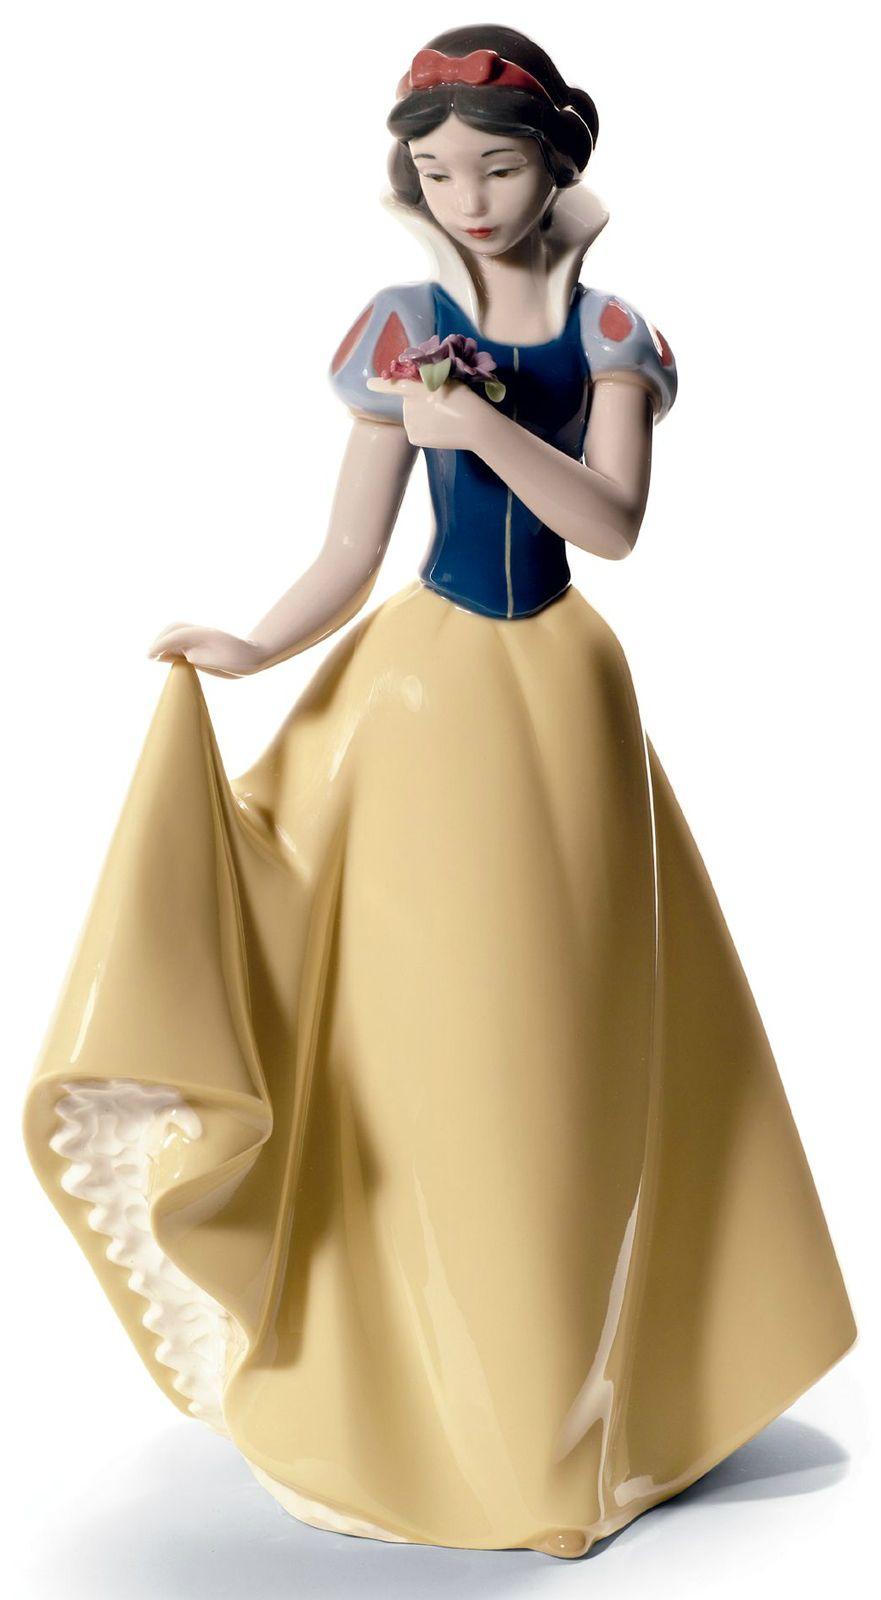 Lladró is a porcelain figurine manufacturer based in Valencia Spain ...